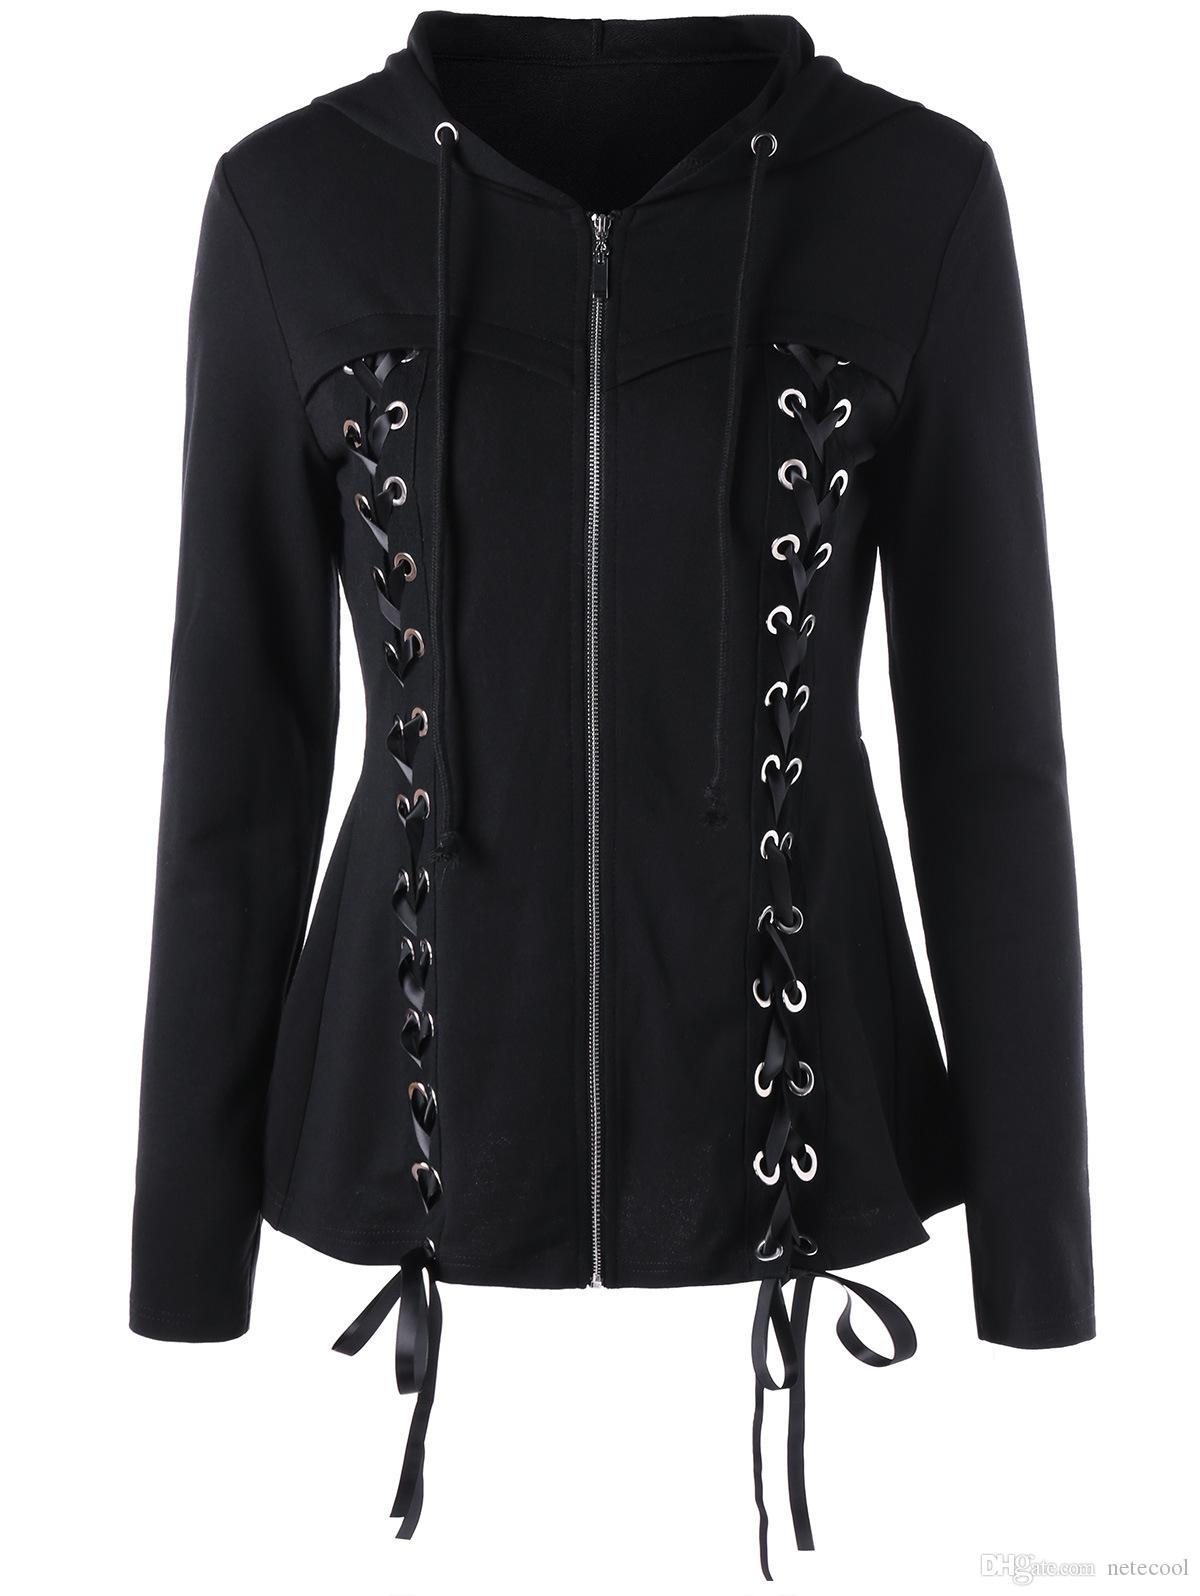 FarJing Womens Hoodies Fashion Casual Sweatshirt Patchwork Hooded Blouse Pullove